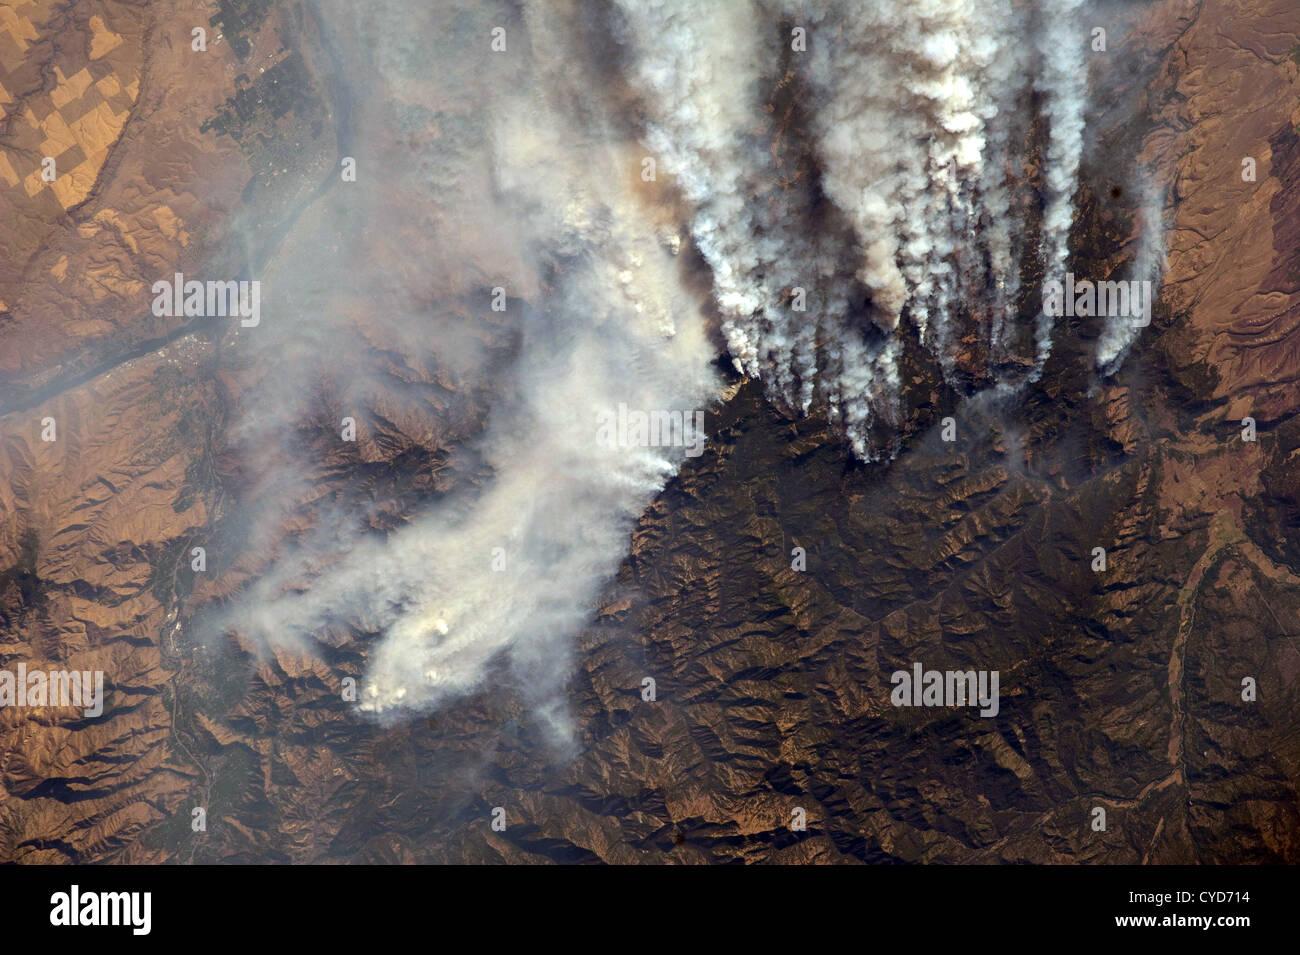 Wildland Fires in Idaho, wildfires, USA - Stock Image